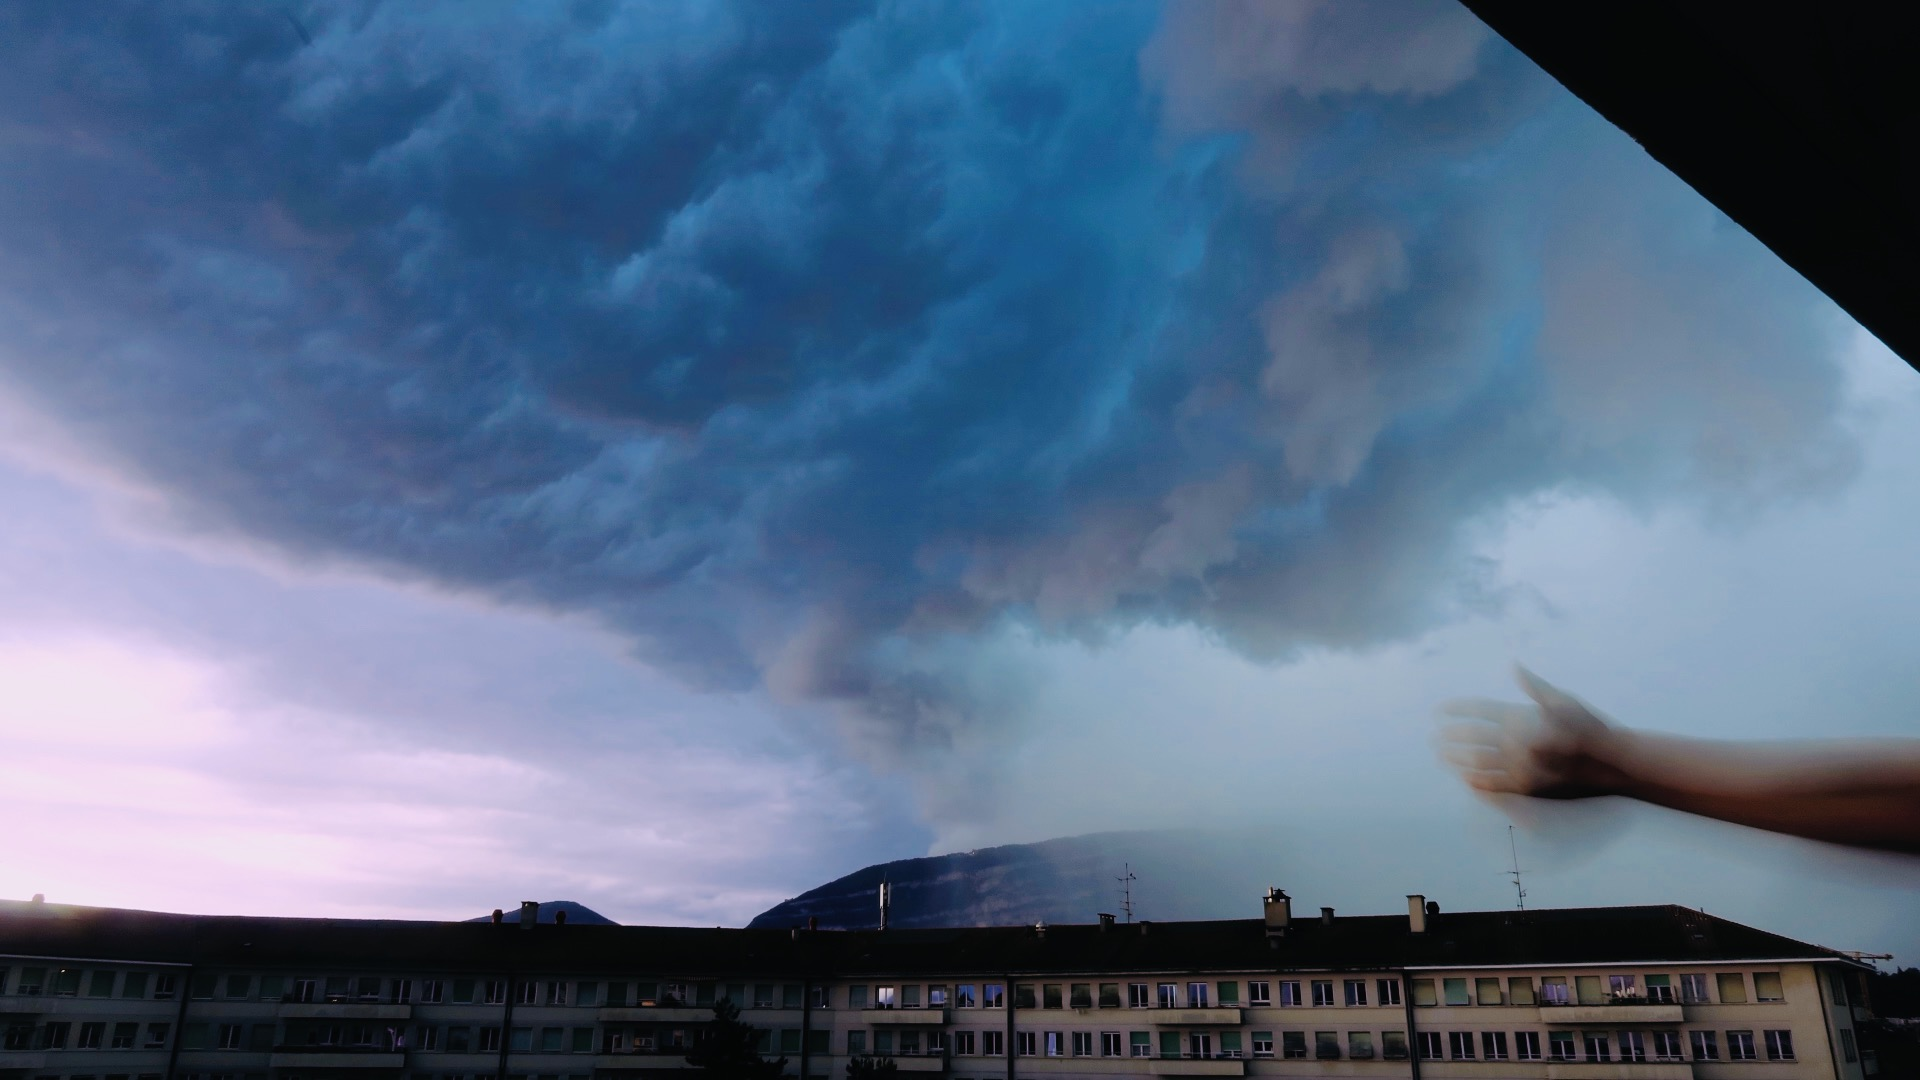 La-tempête_2